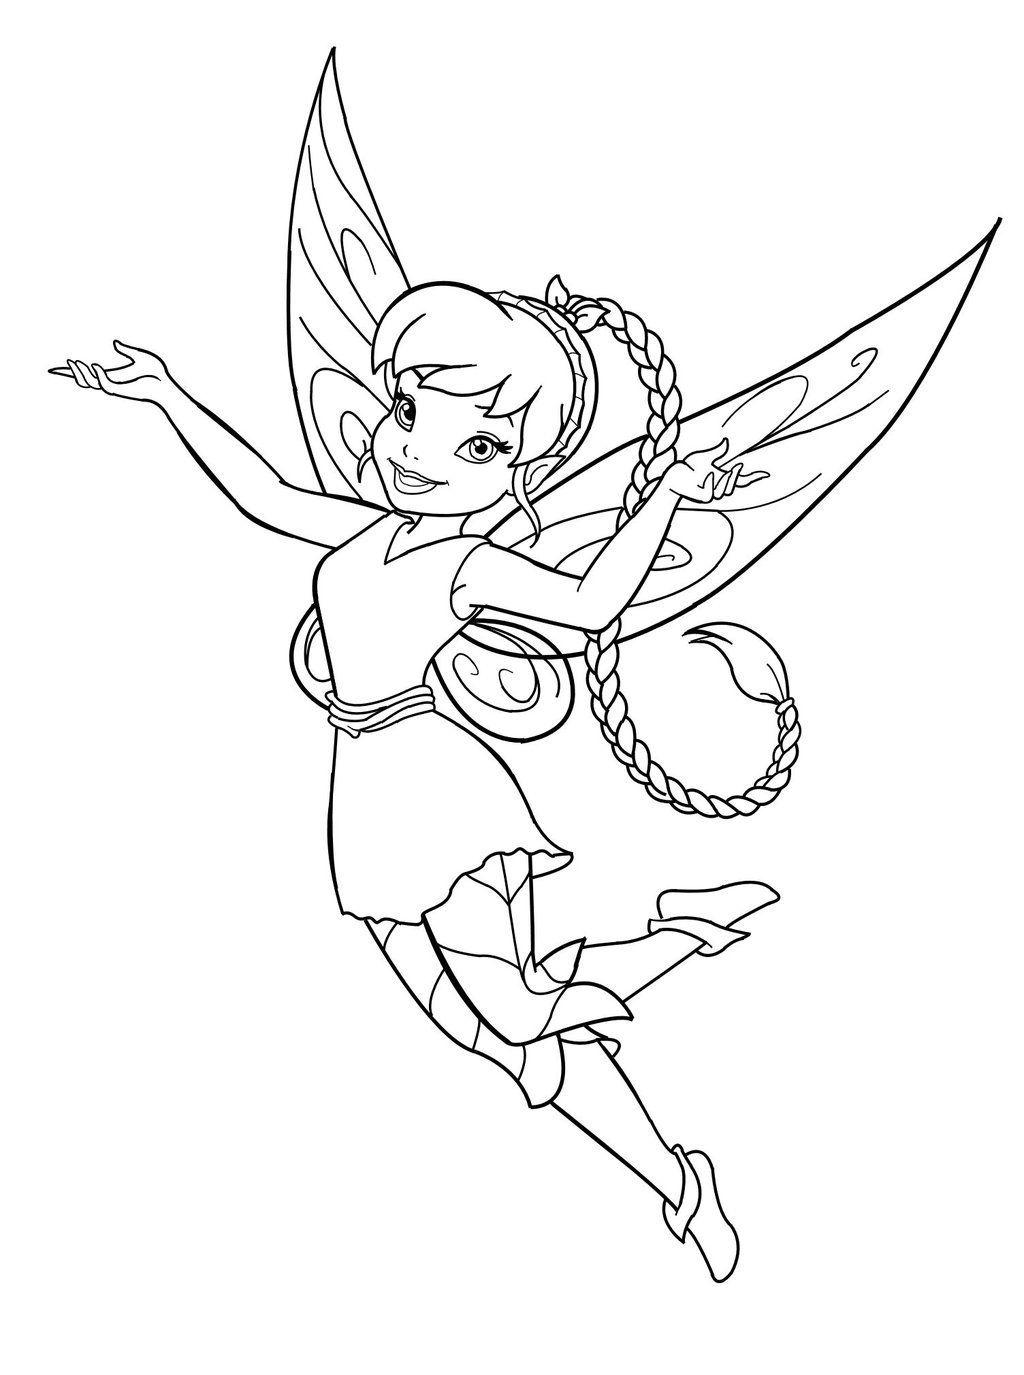 Disney Fairy_Fawn Lineart by MercuriusNeko   HADAS Y DUENDES ...